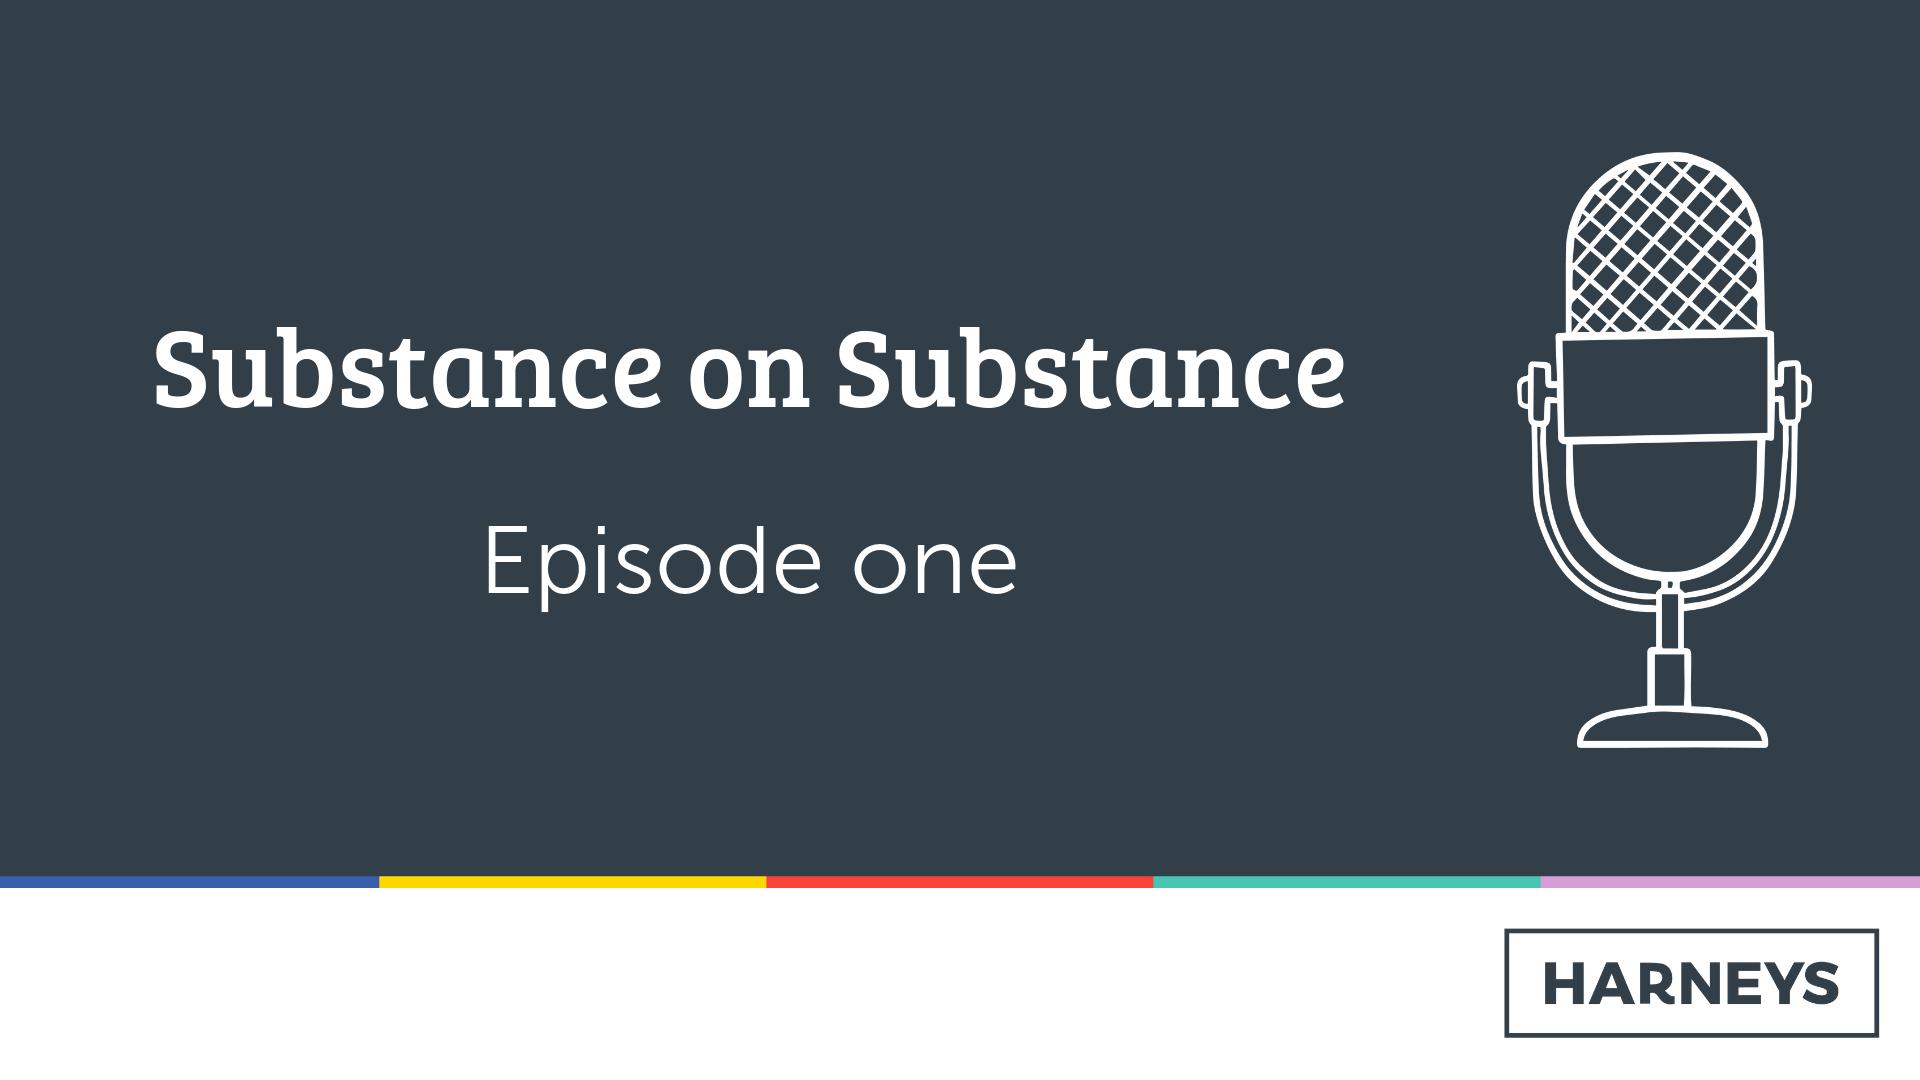 Subtance on Substance: Episode One